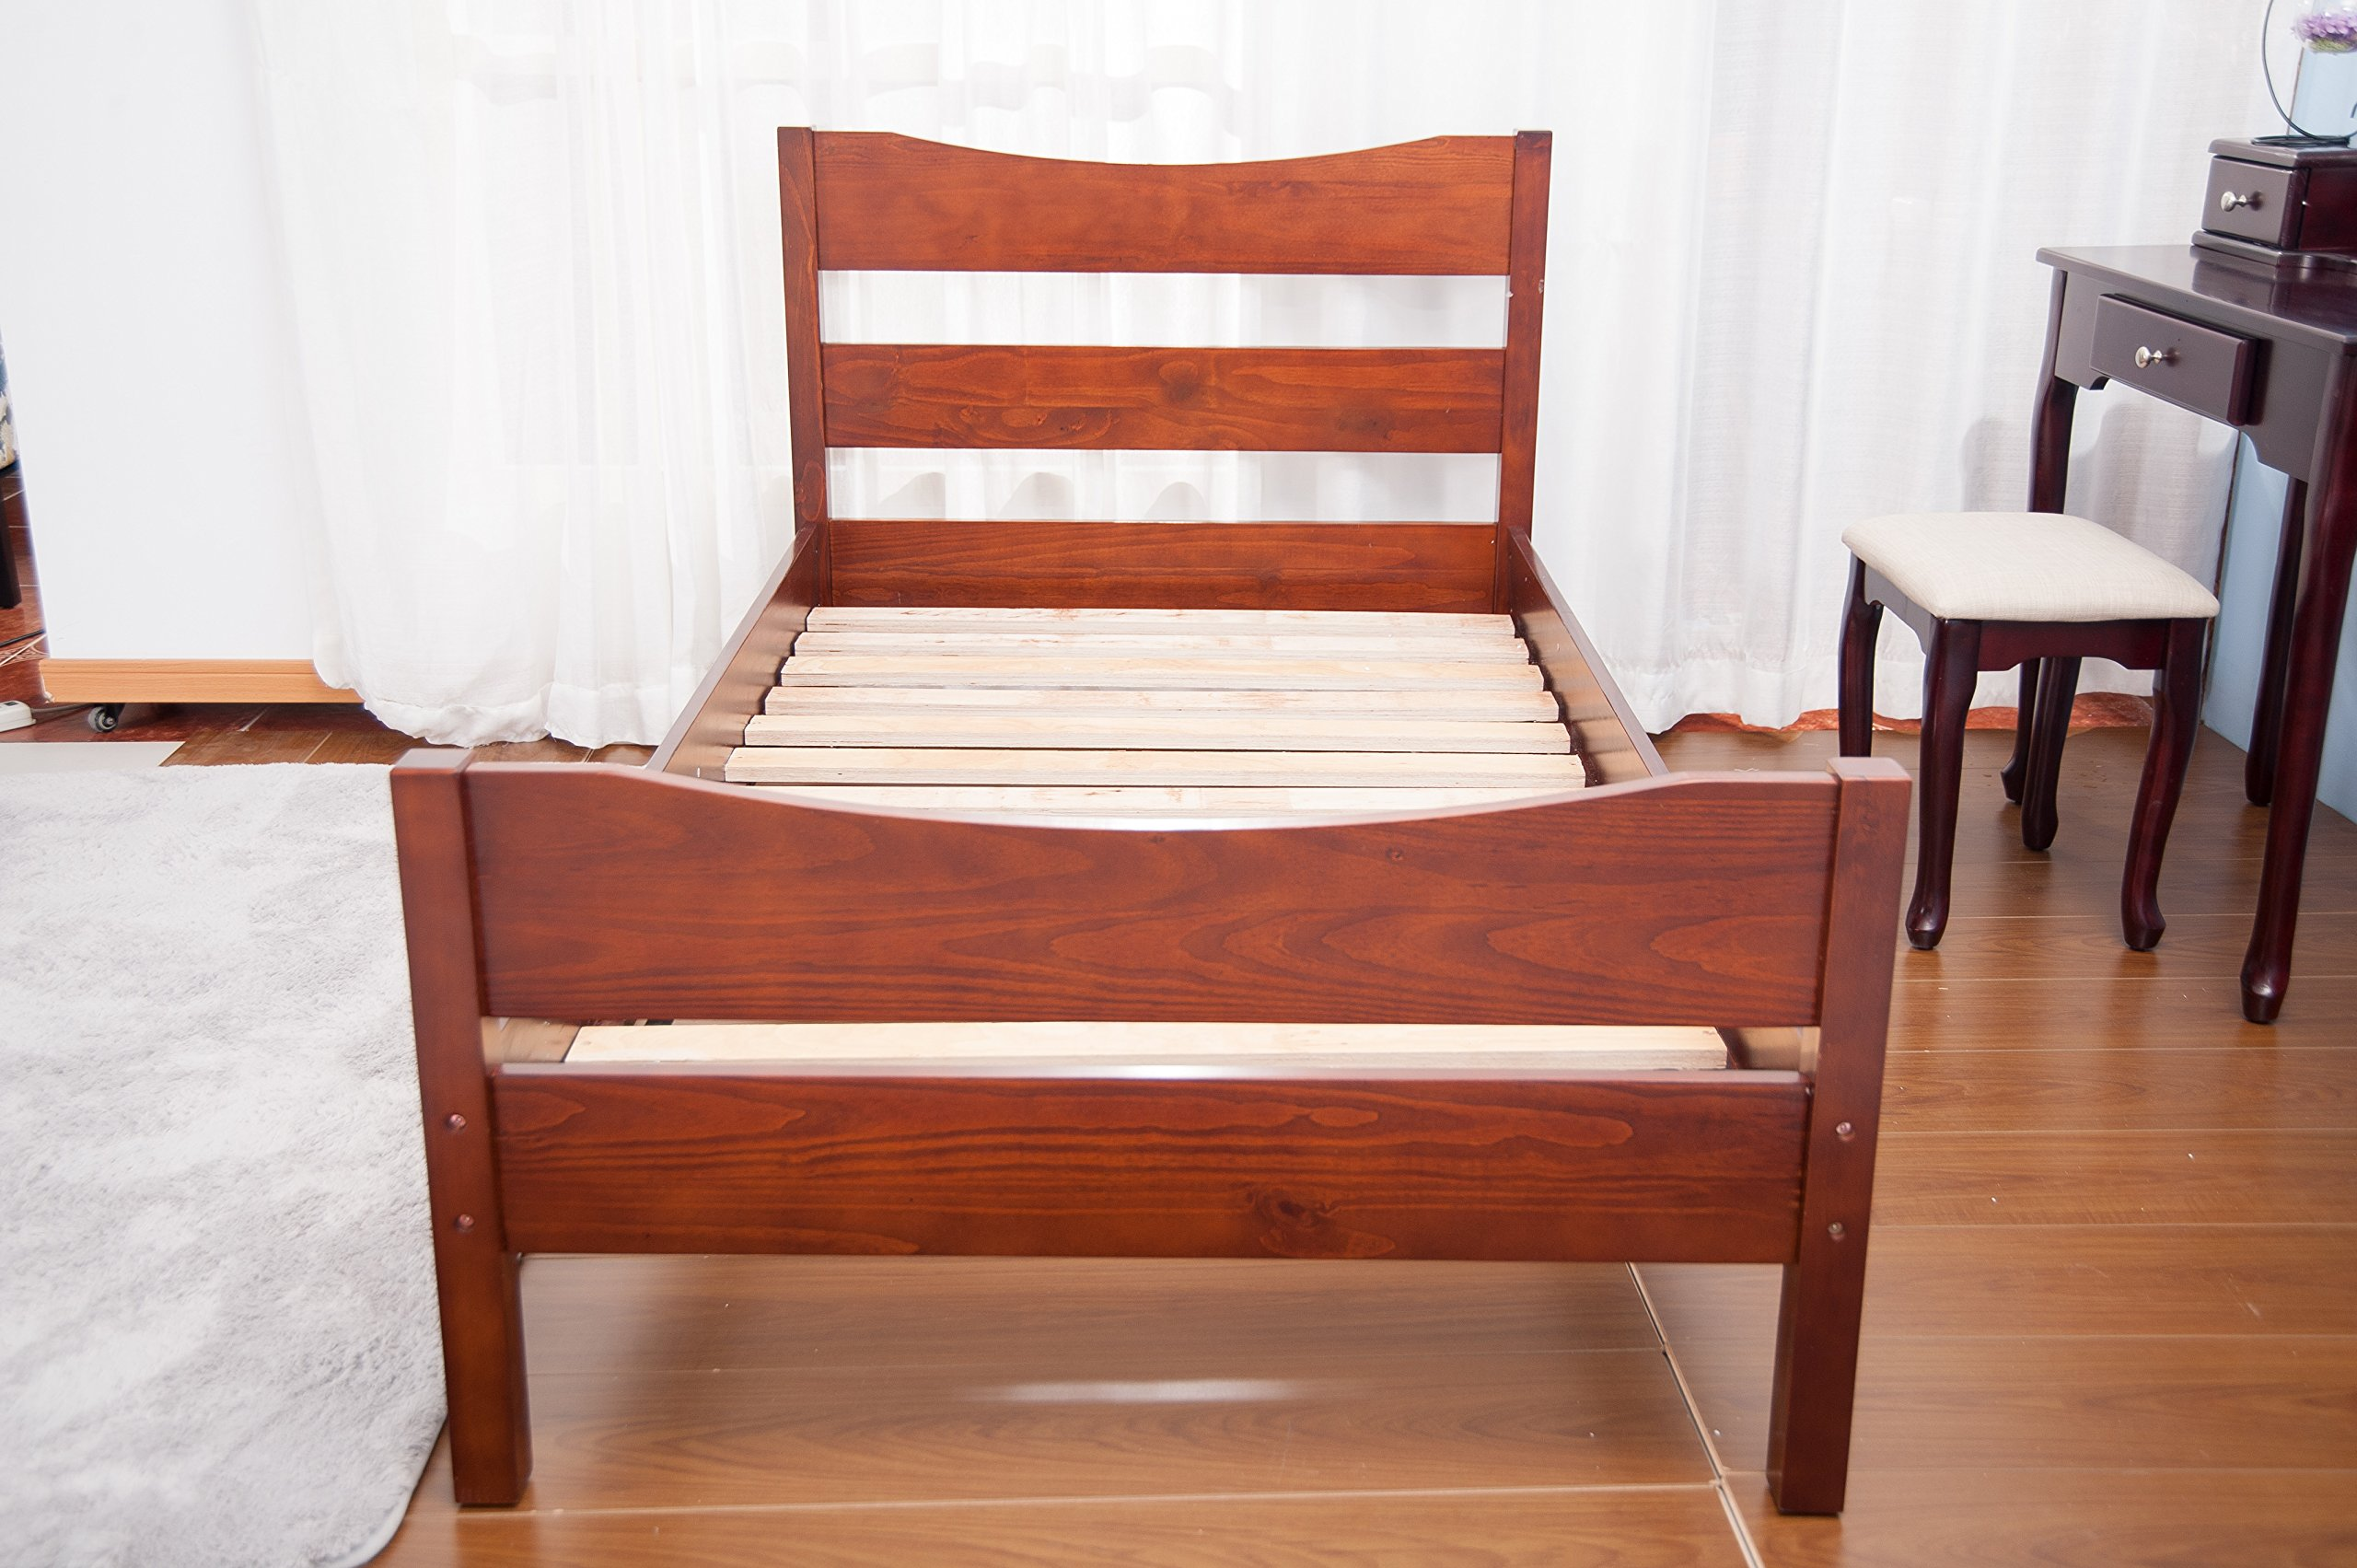 Merax Wood Platform Bed Frame with Headboard / No Box Spring Needed / Wooden Slat Support / Espresso Finish (-Walnut-) by Merax. (Image #2)